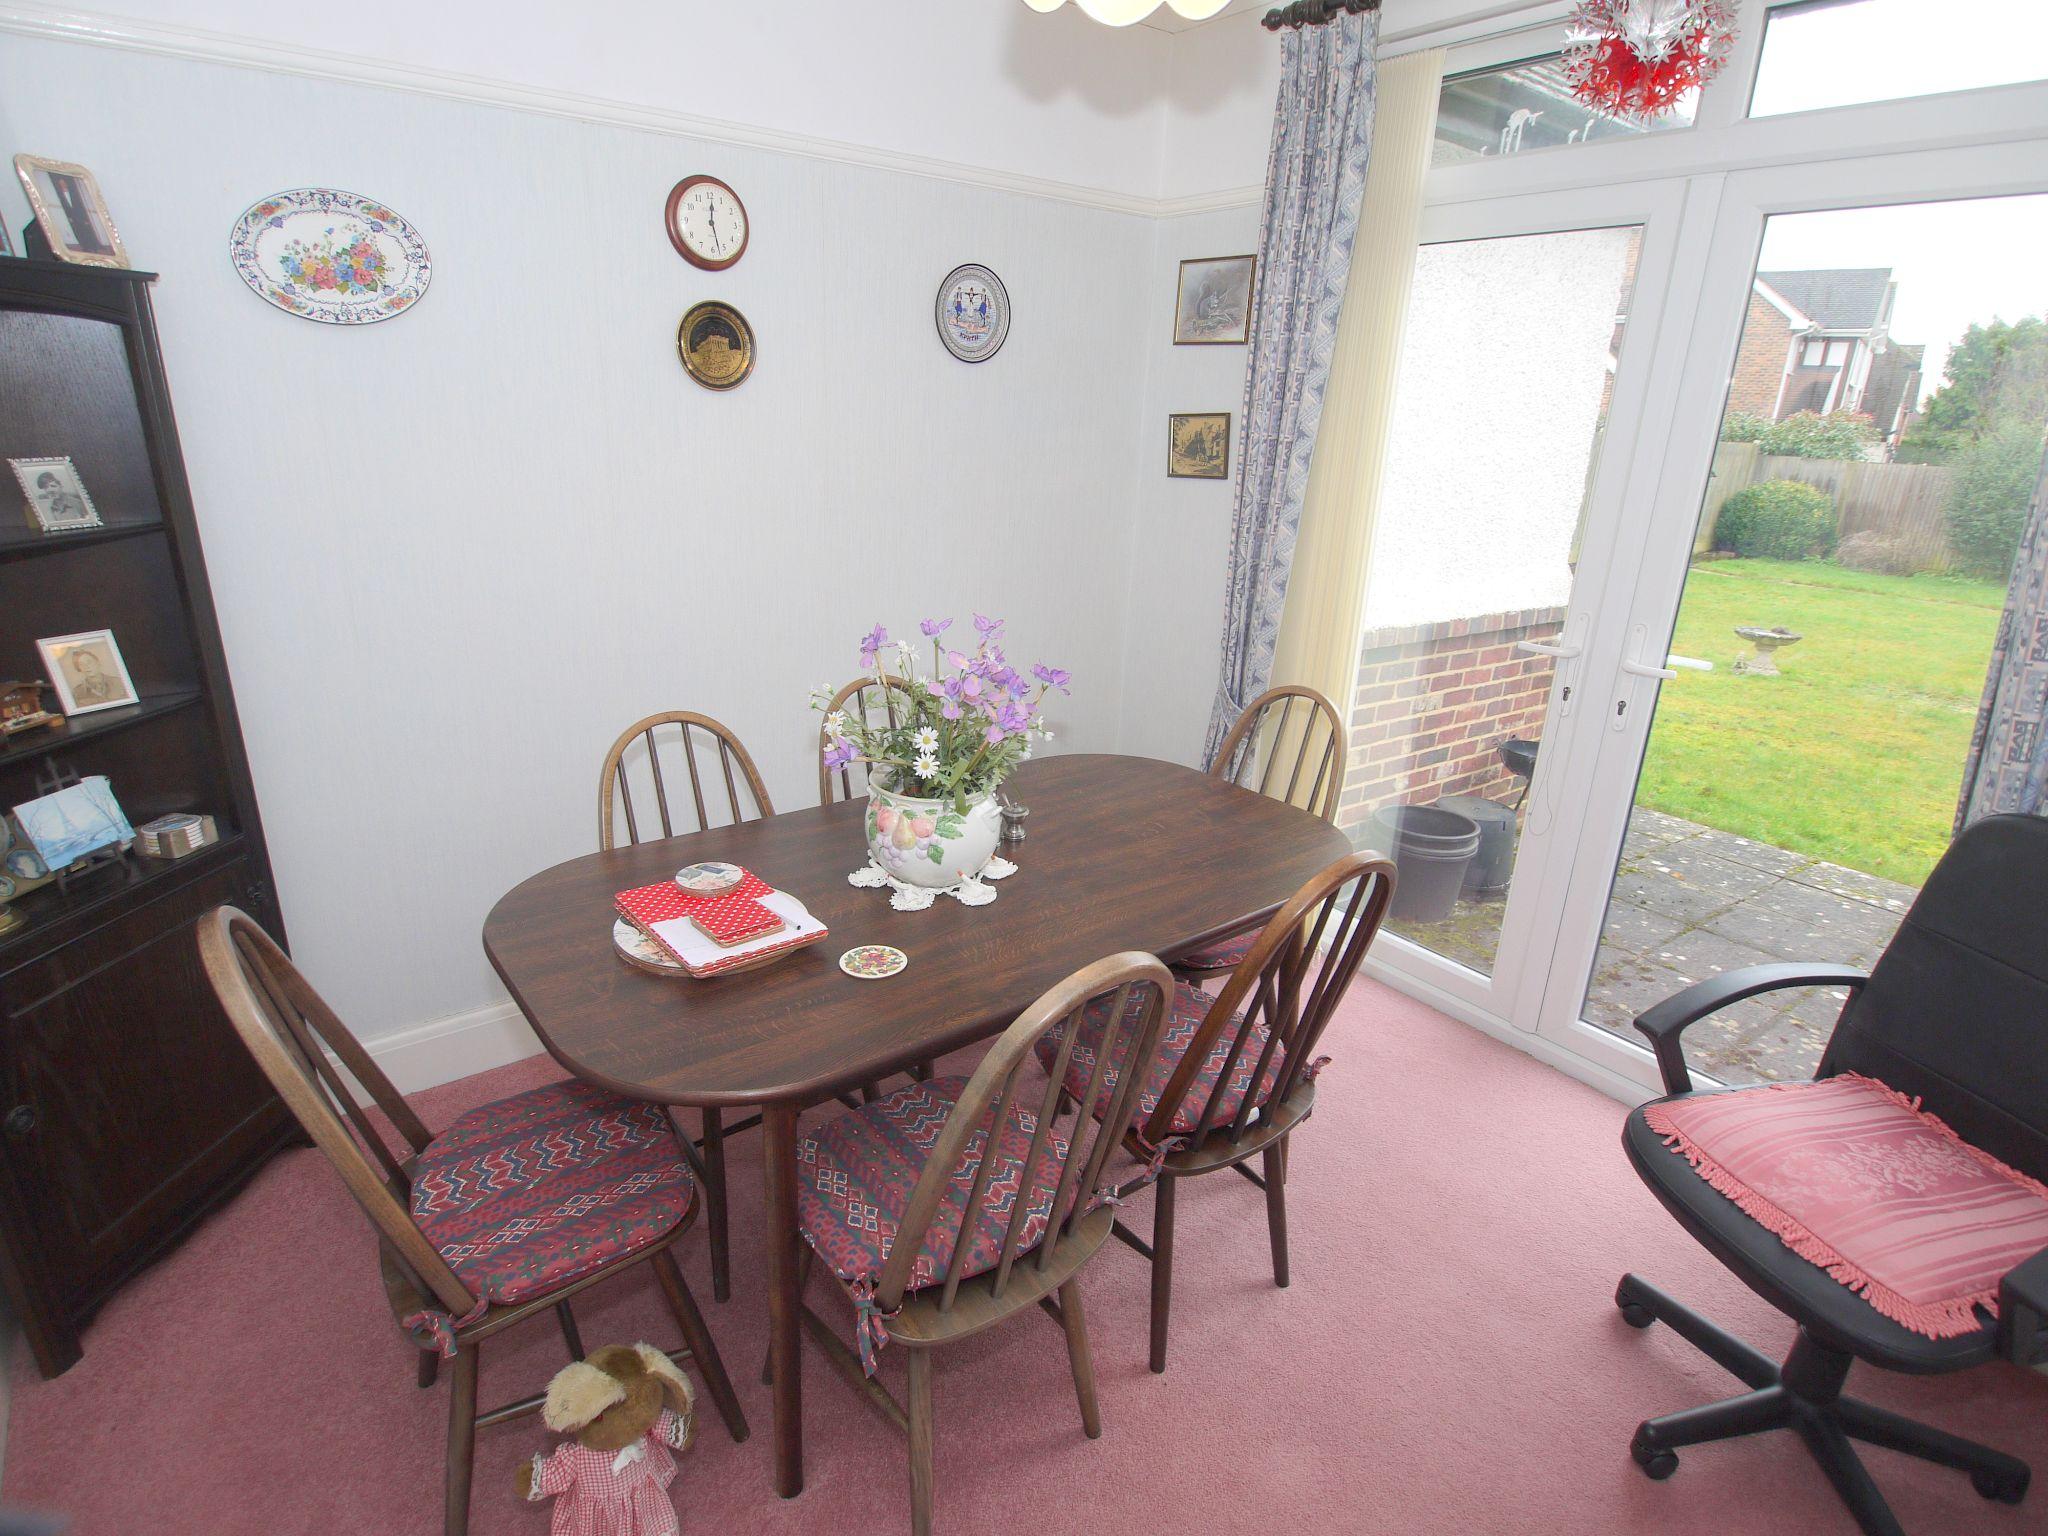 3 bedroom detached bungalow Sold in Sevenoaks - Photograph 3